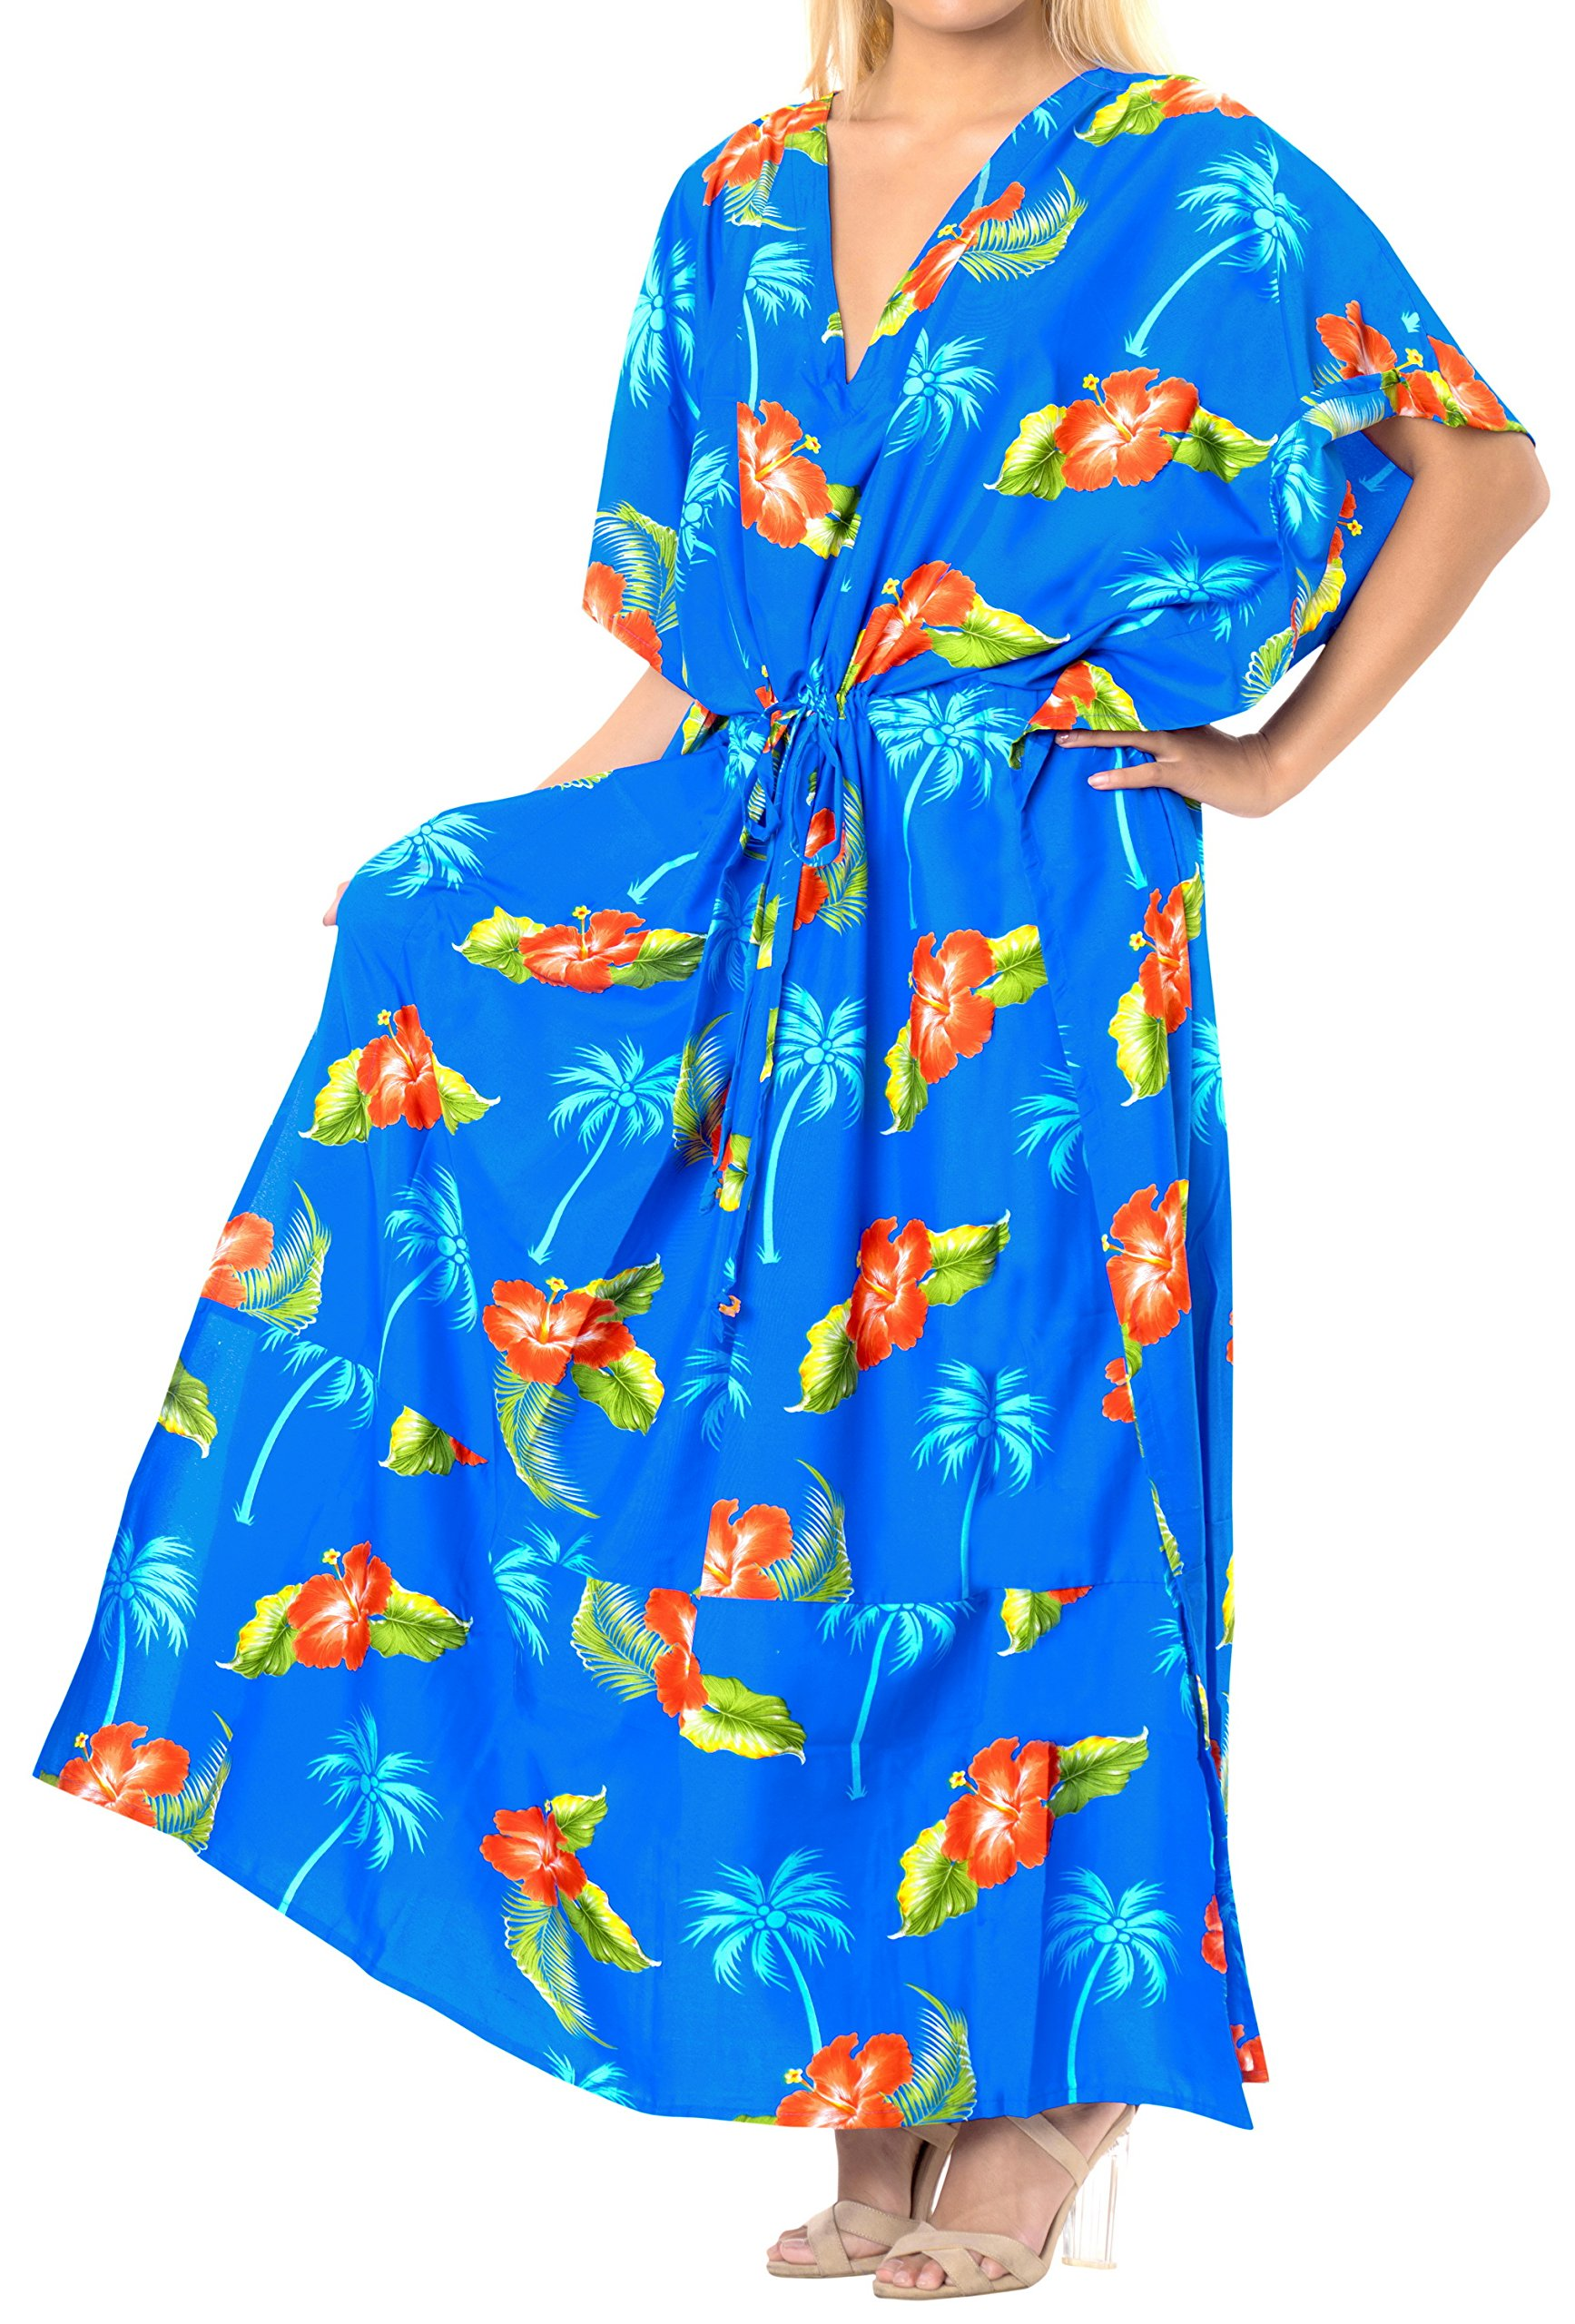 LA LEELA Likre Printed Long Caftan Dress Girl Bright Blue_675 OSFM 14-22W [L-3X]